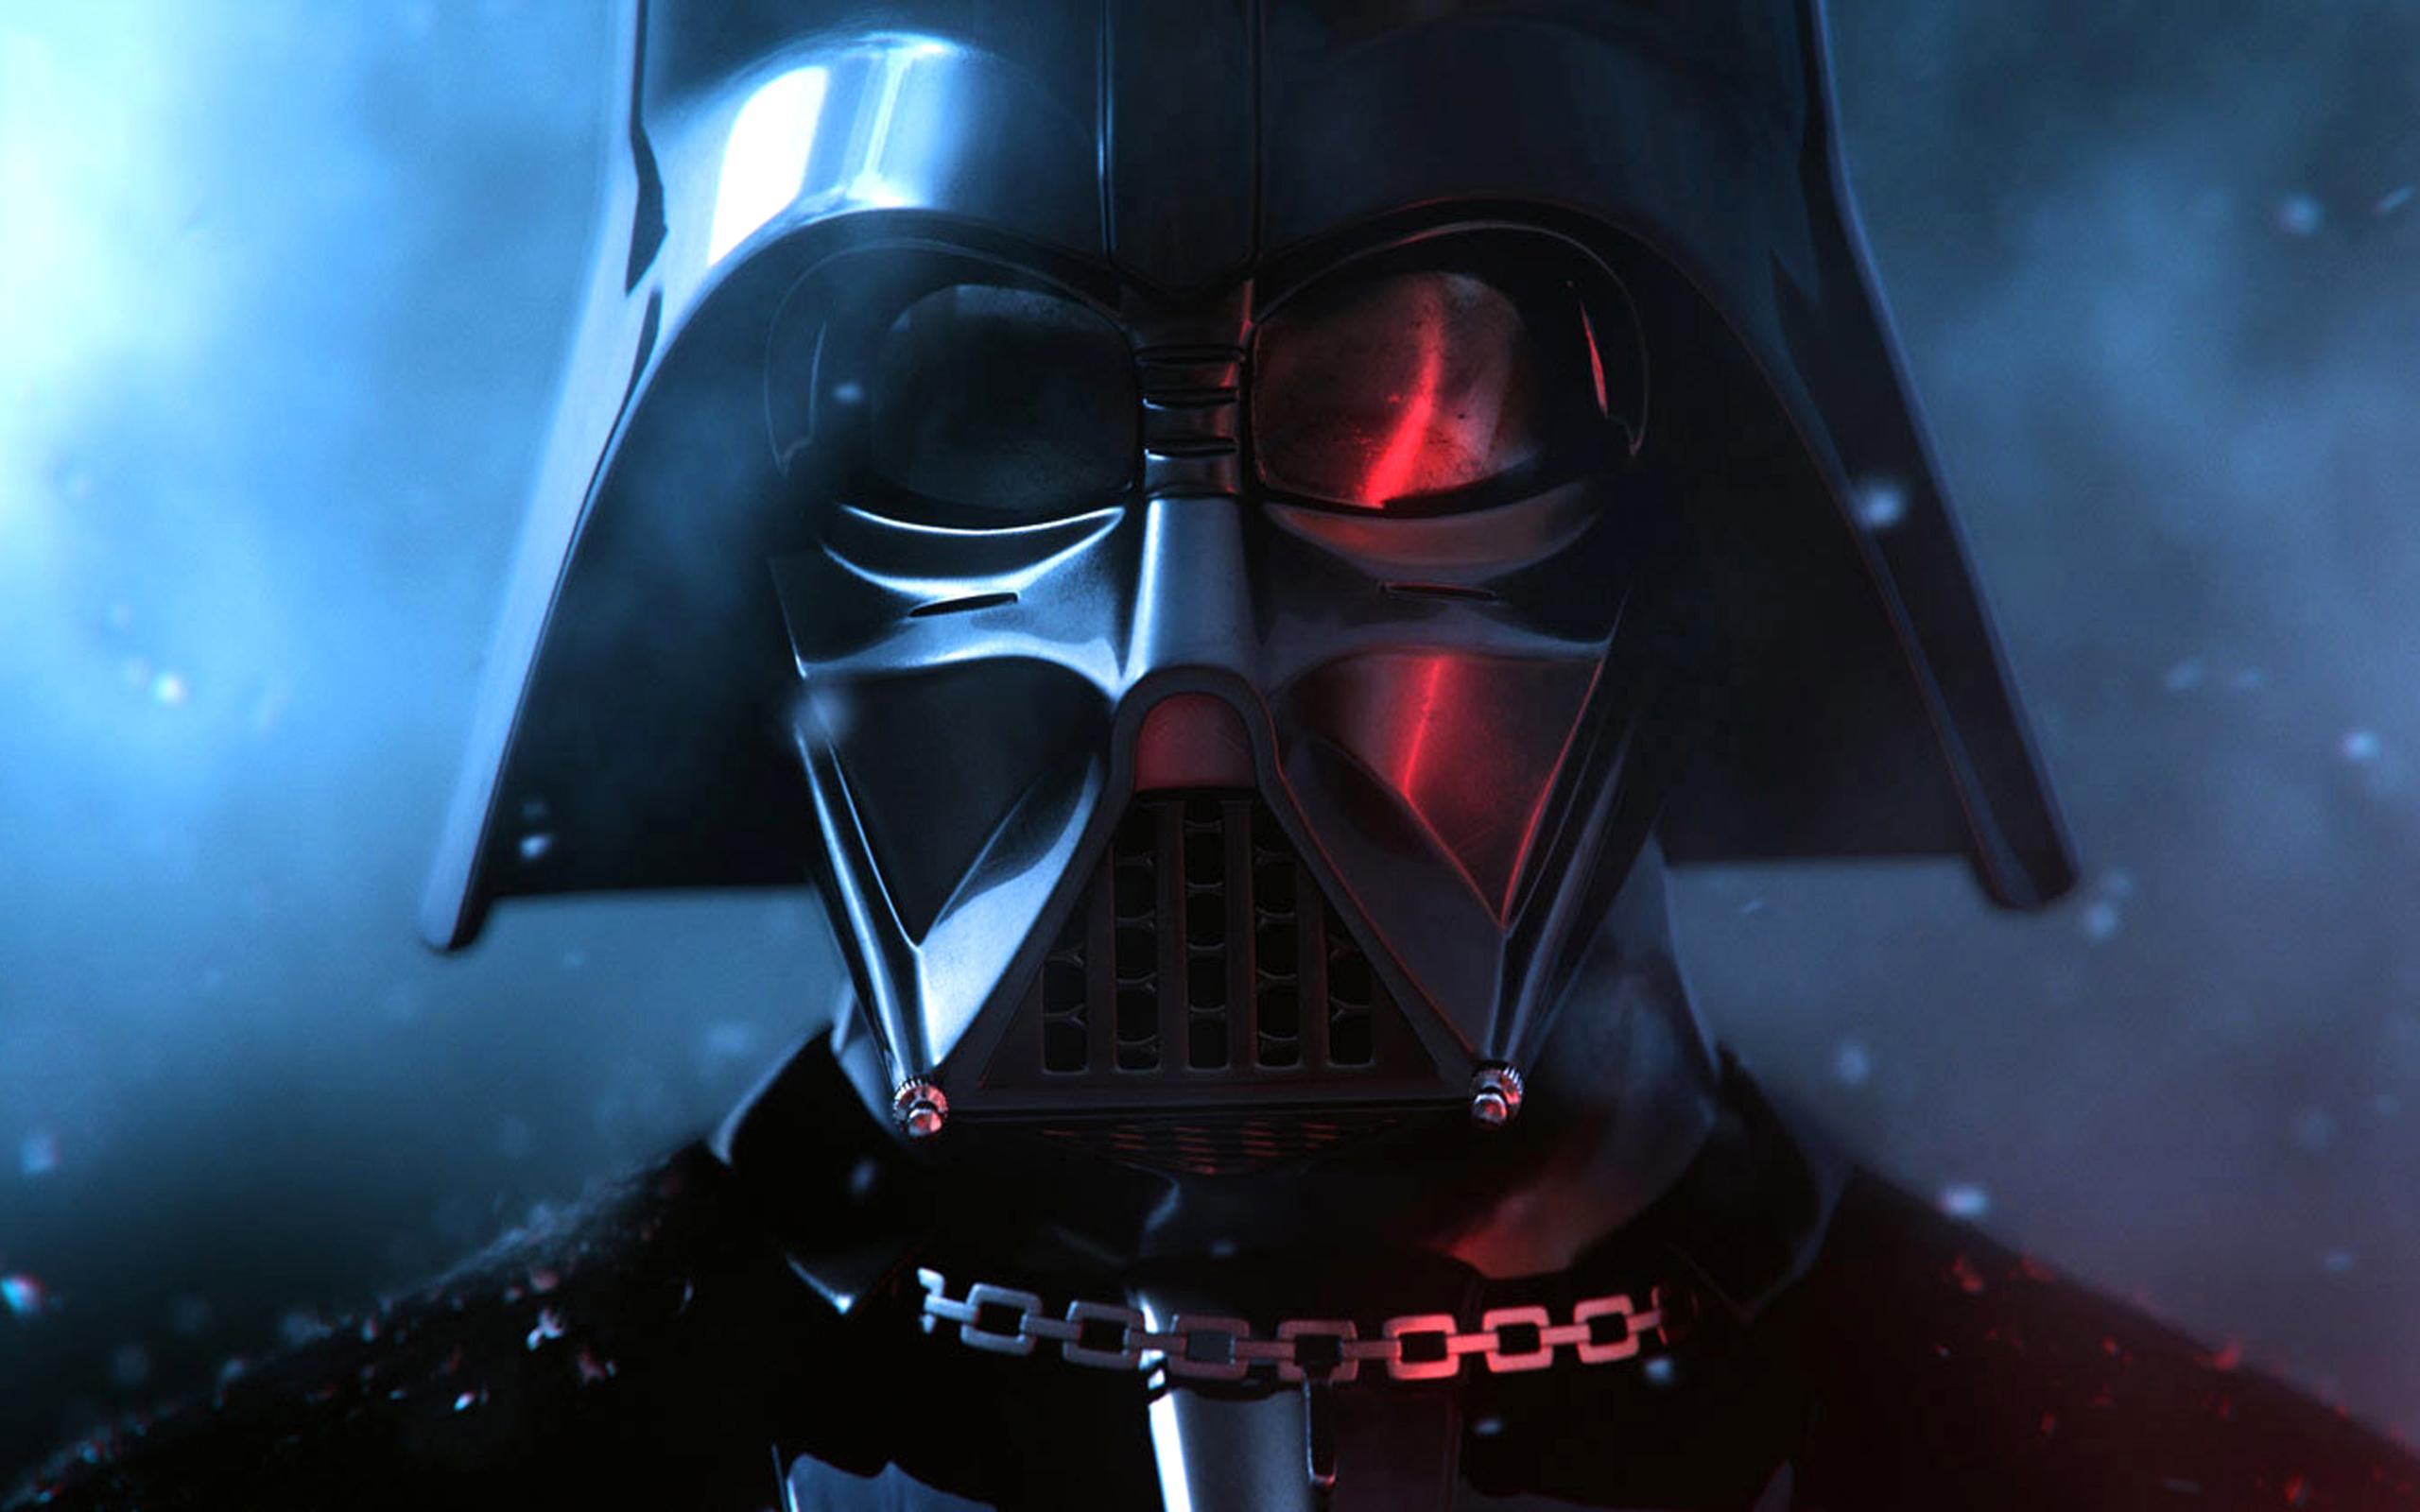 Darth Vader 2 Wallpapers HD Wallpapers 2560x1600